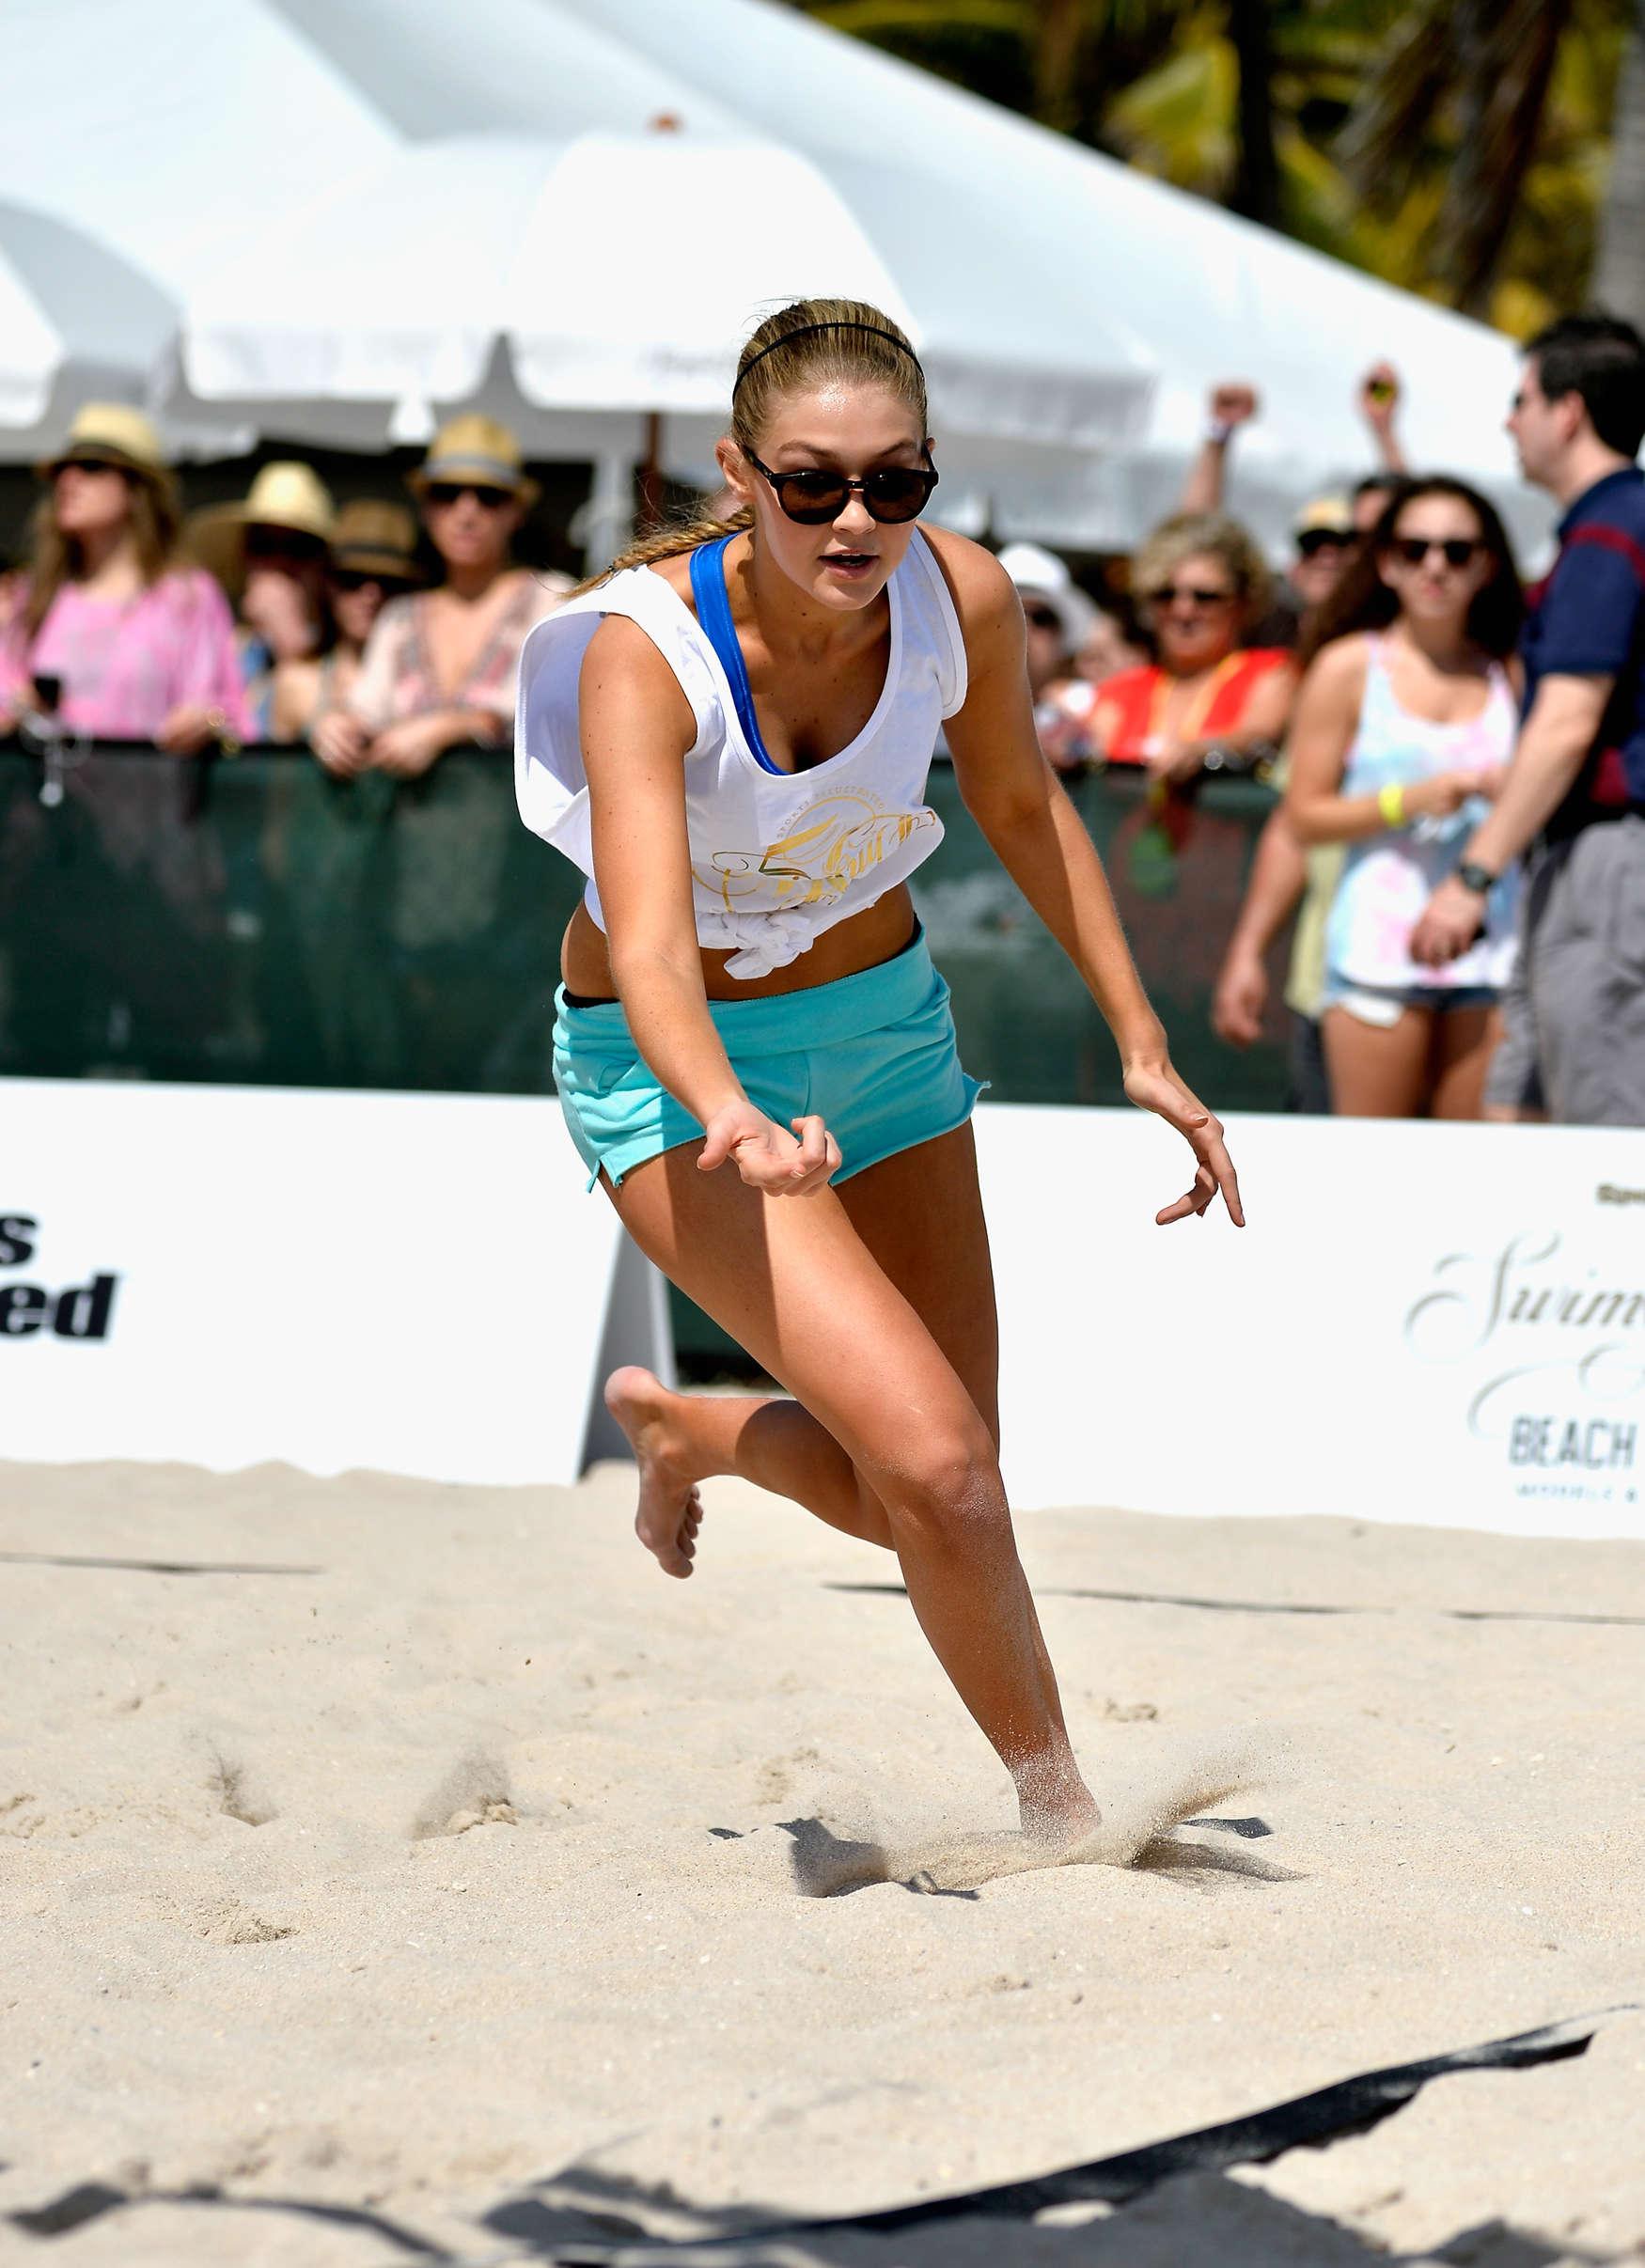 Nina Agdal Hits the Volleyball at the Sports Illustrated